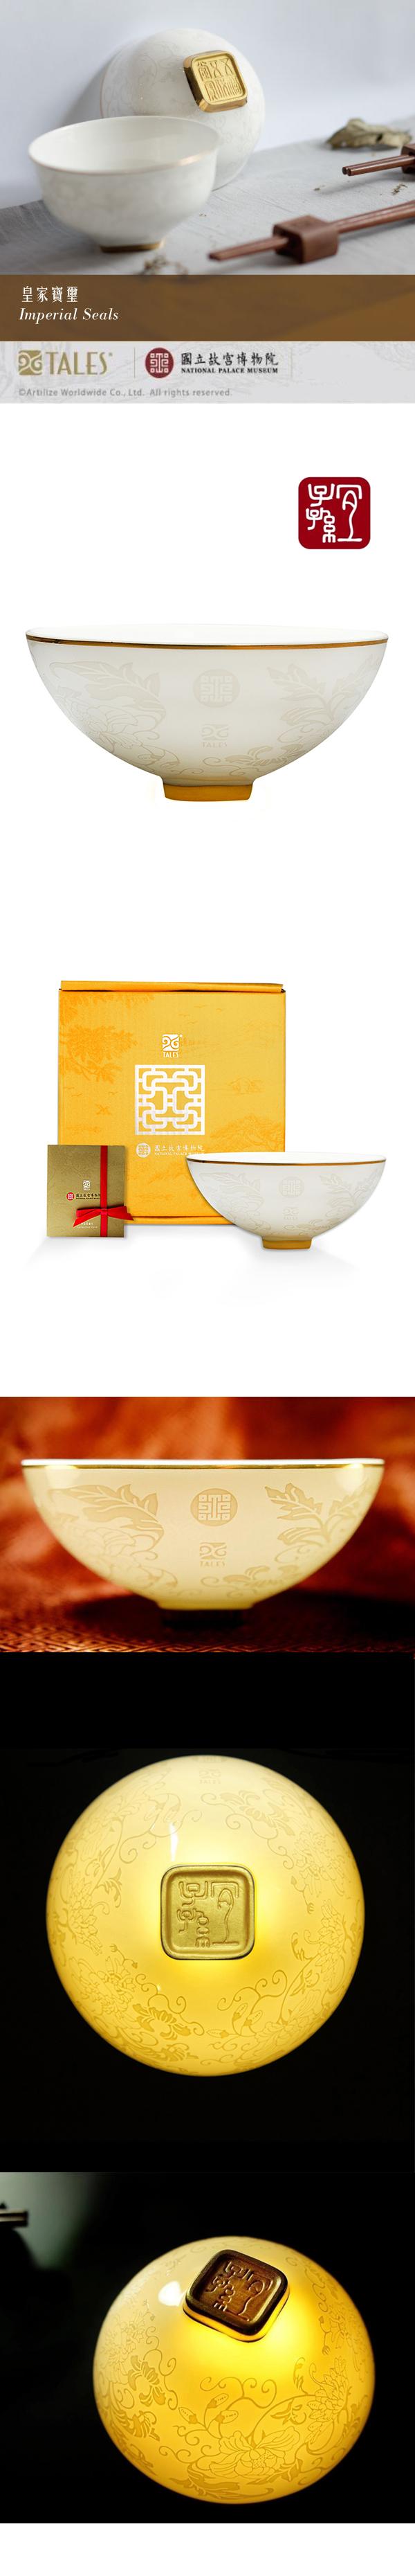 TALES 神話言 故宮神話系列 皇家寶璽 宜子孫 (單碗)